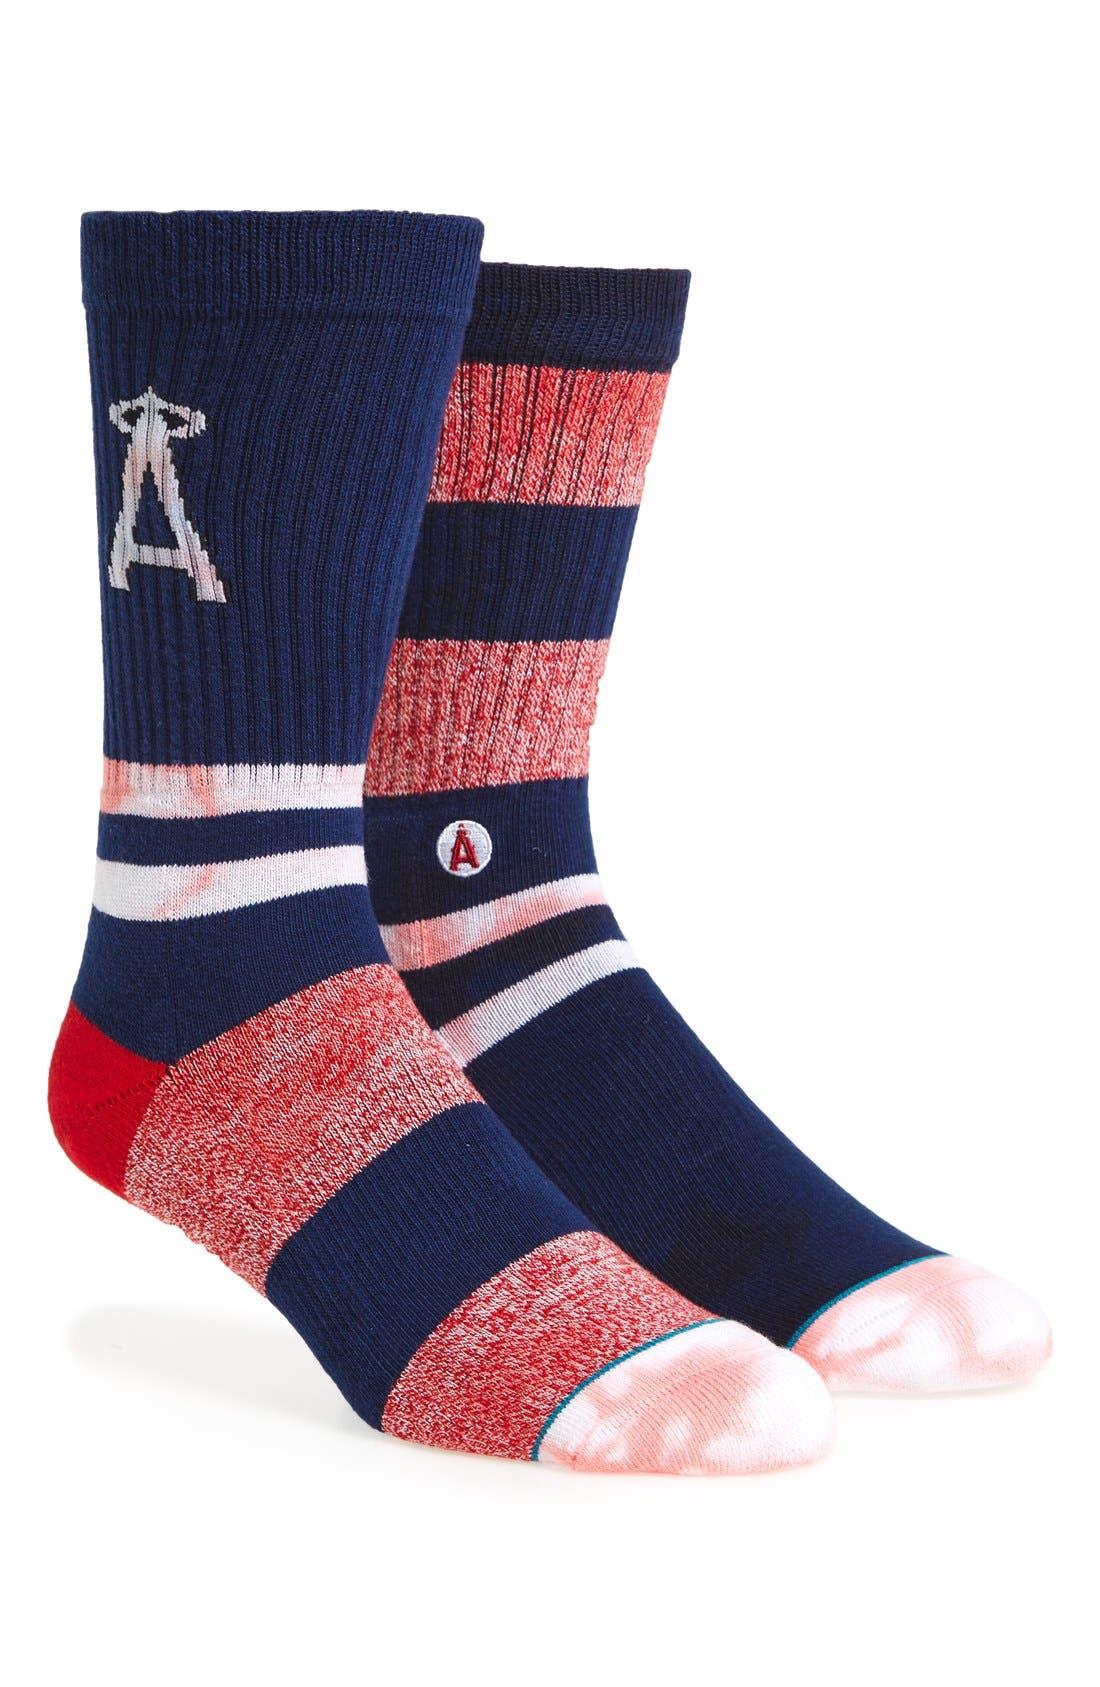 MLB Tye Dye Summer League Angels Crew Socks,                         Main,                         color, 410